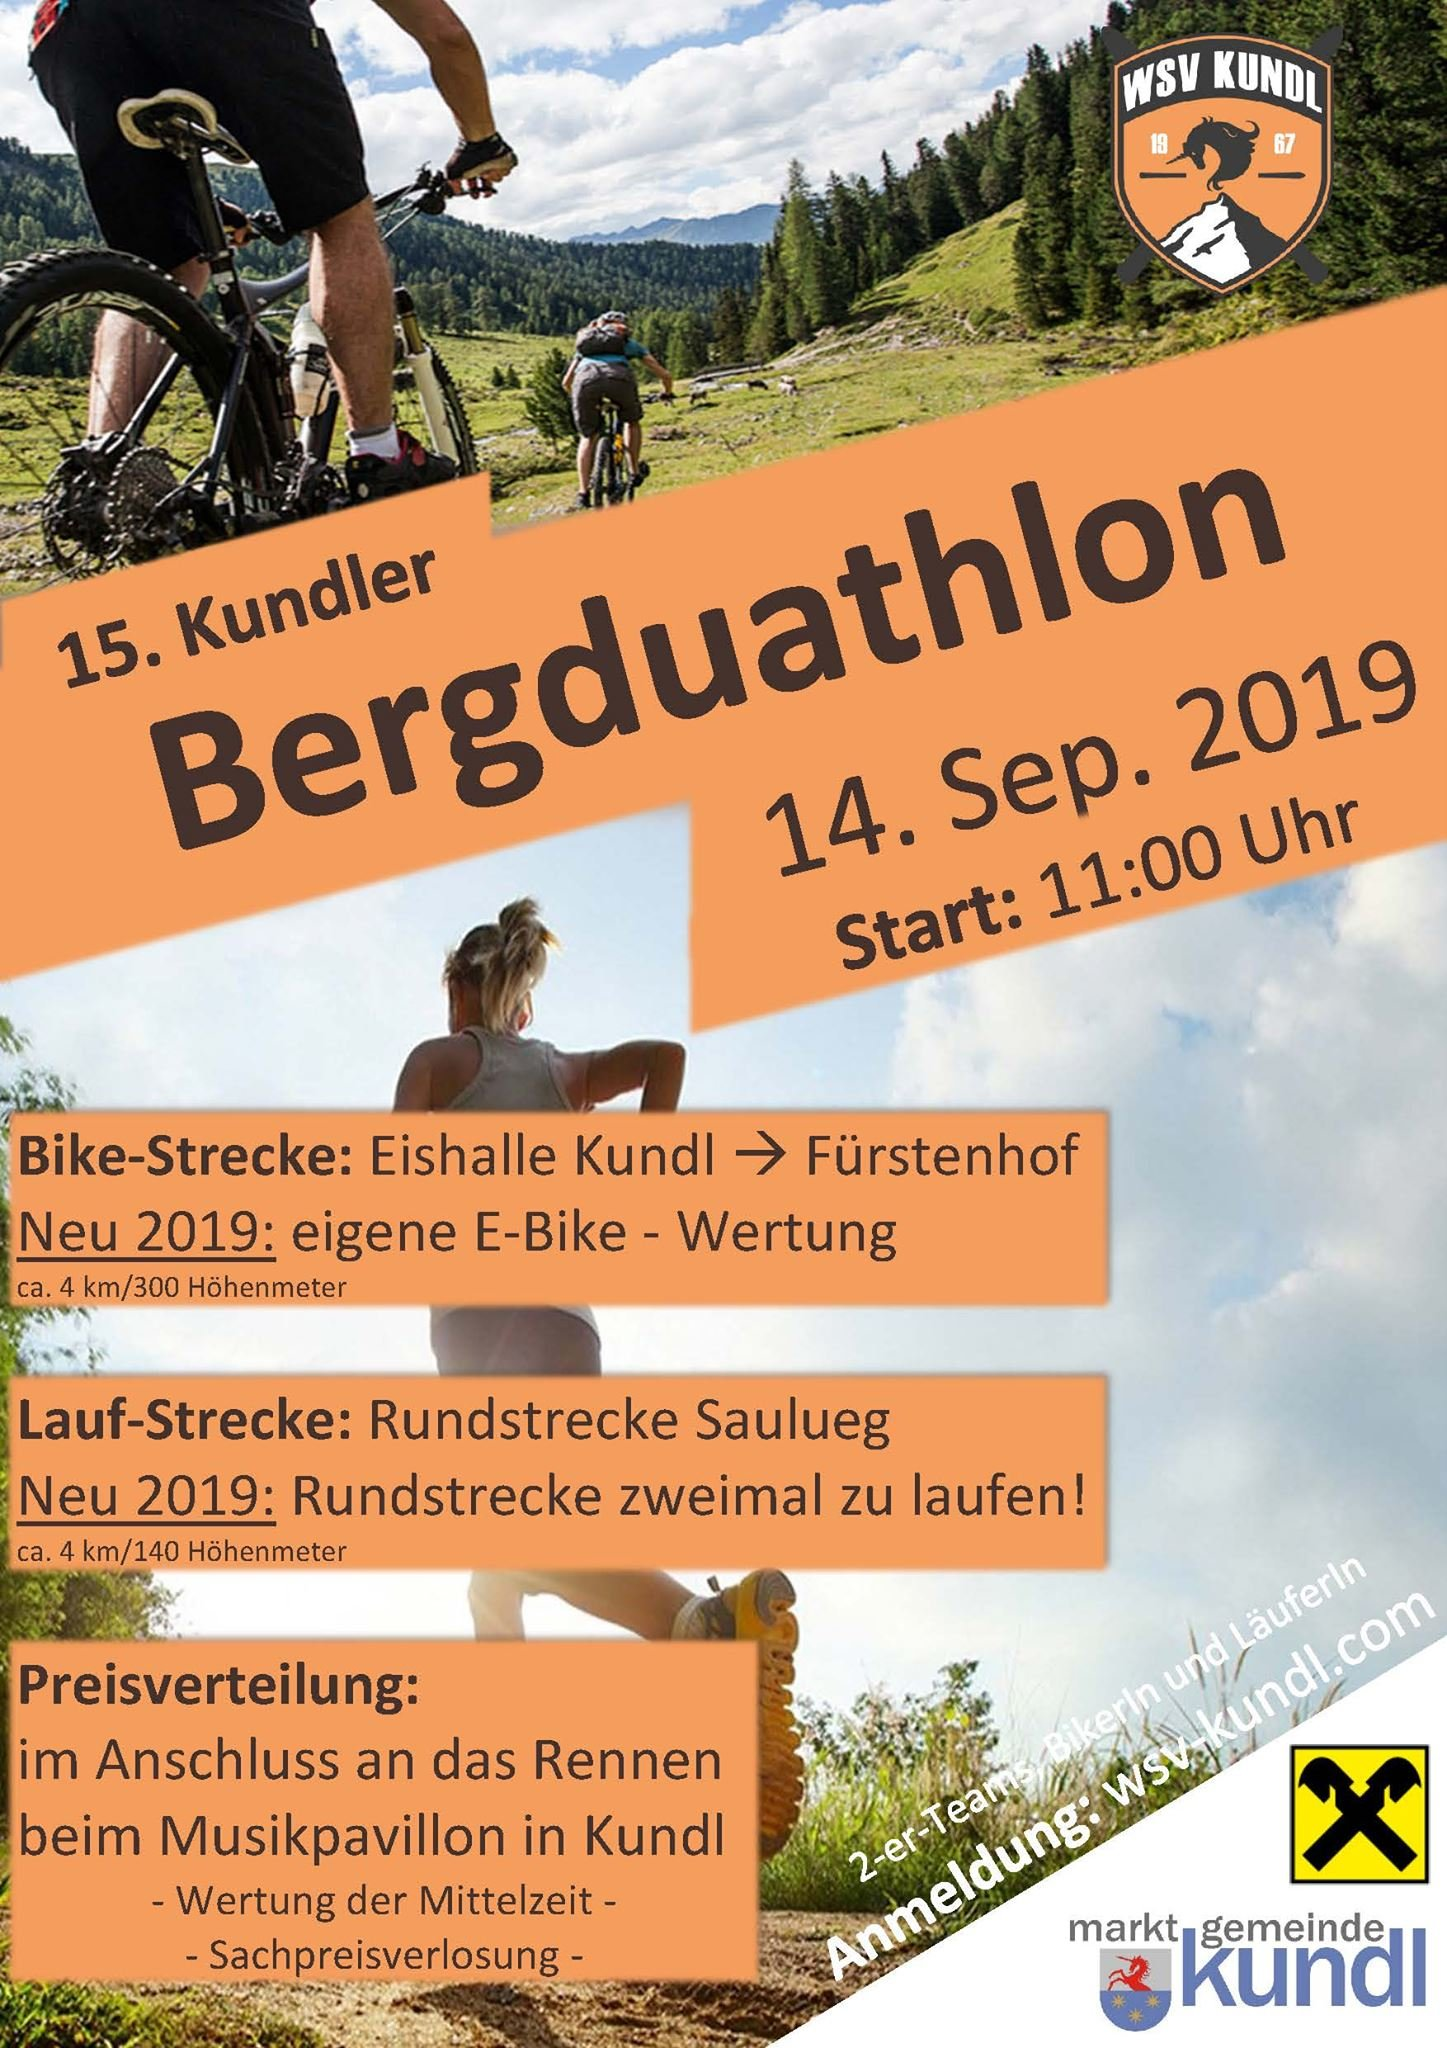 Bergduathlon